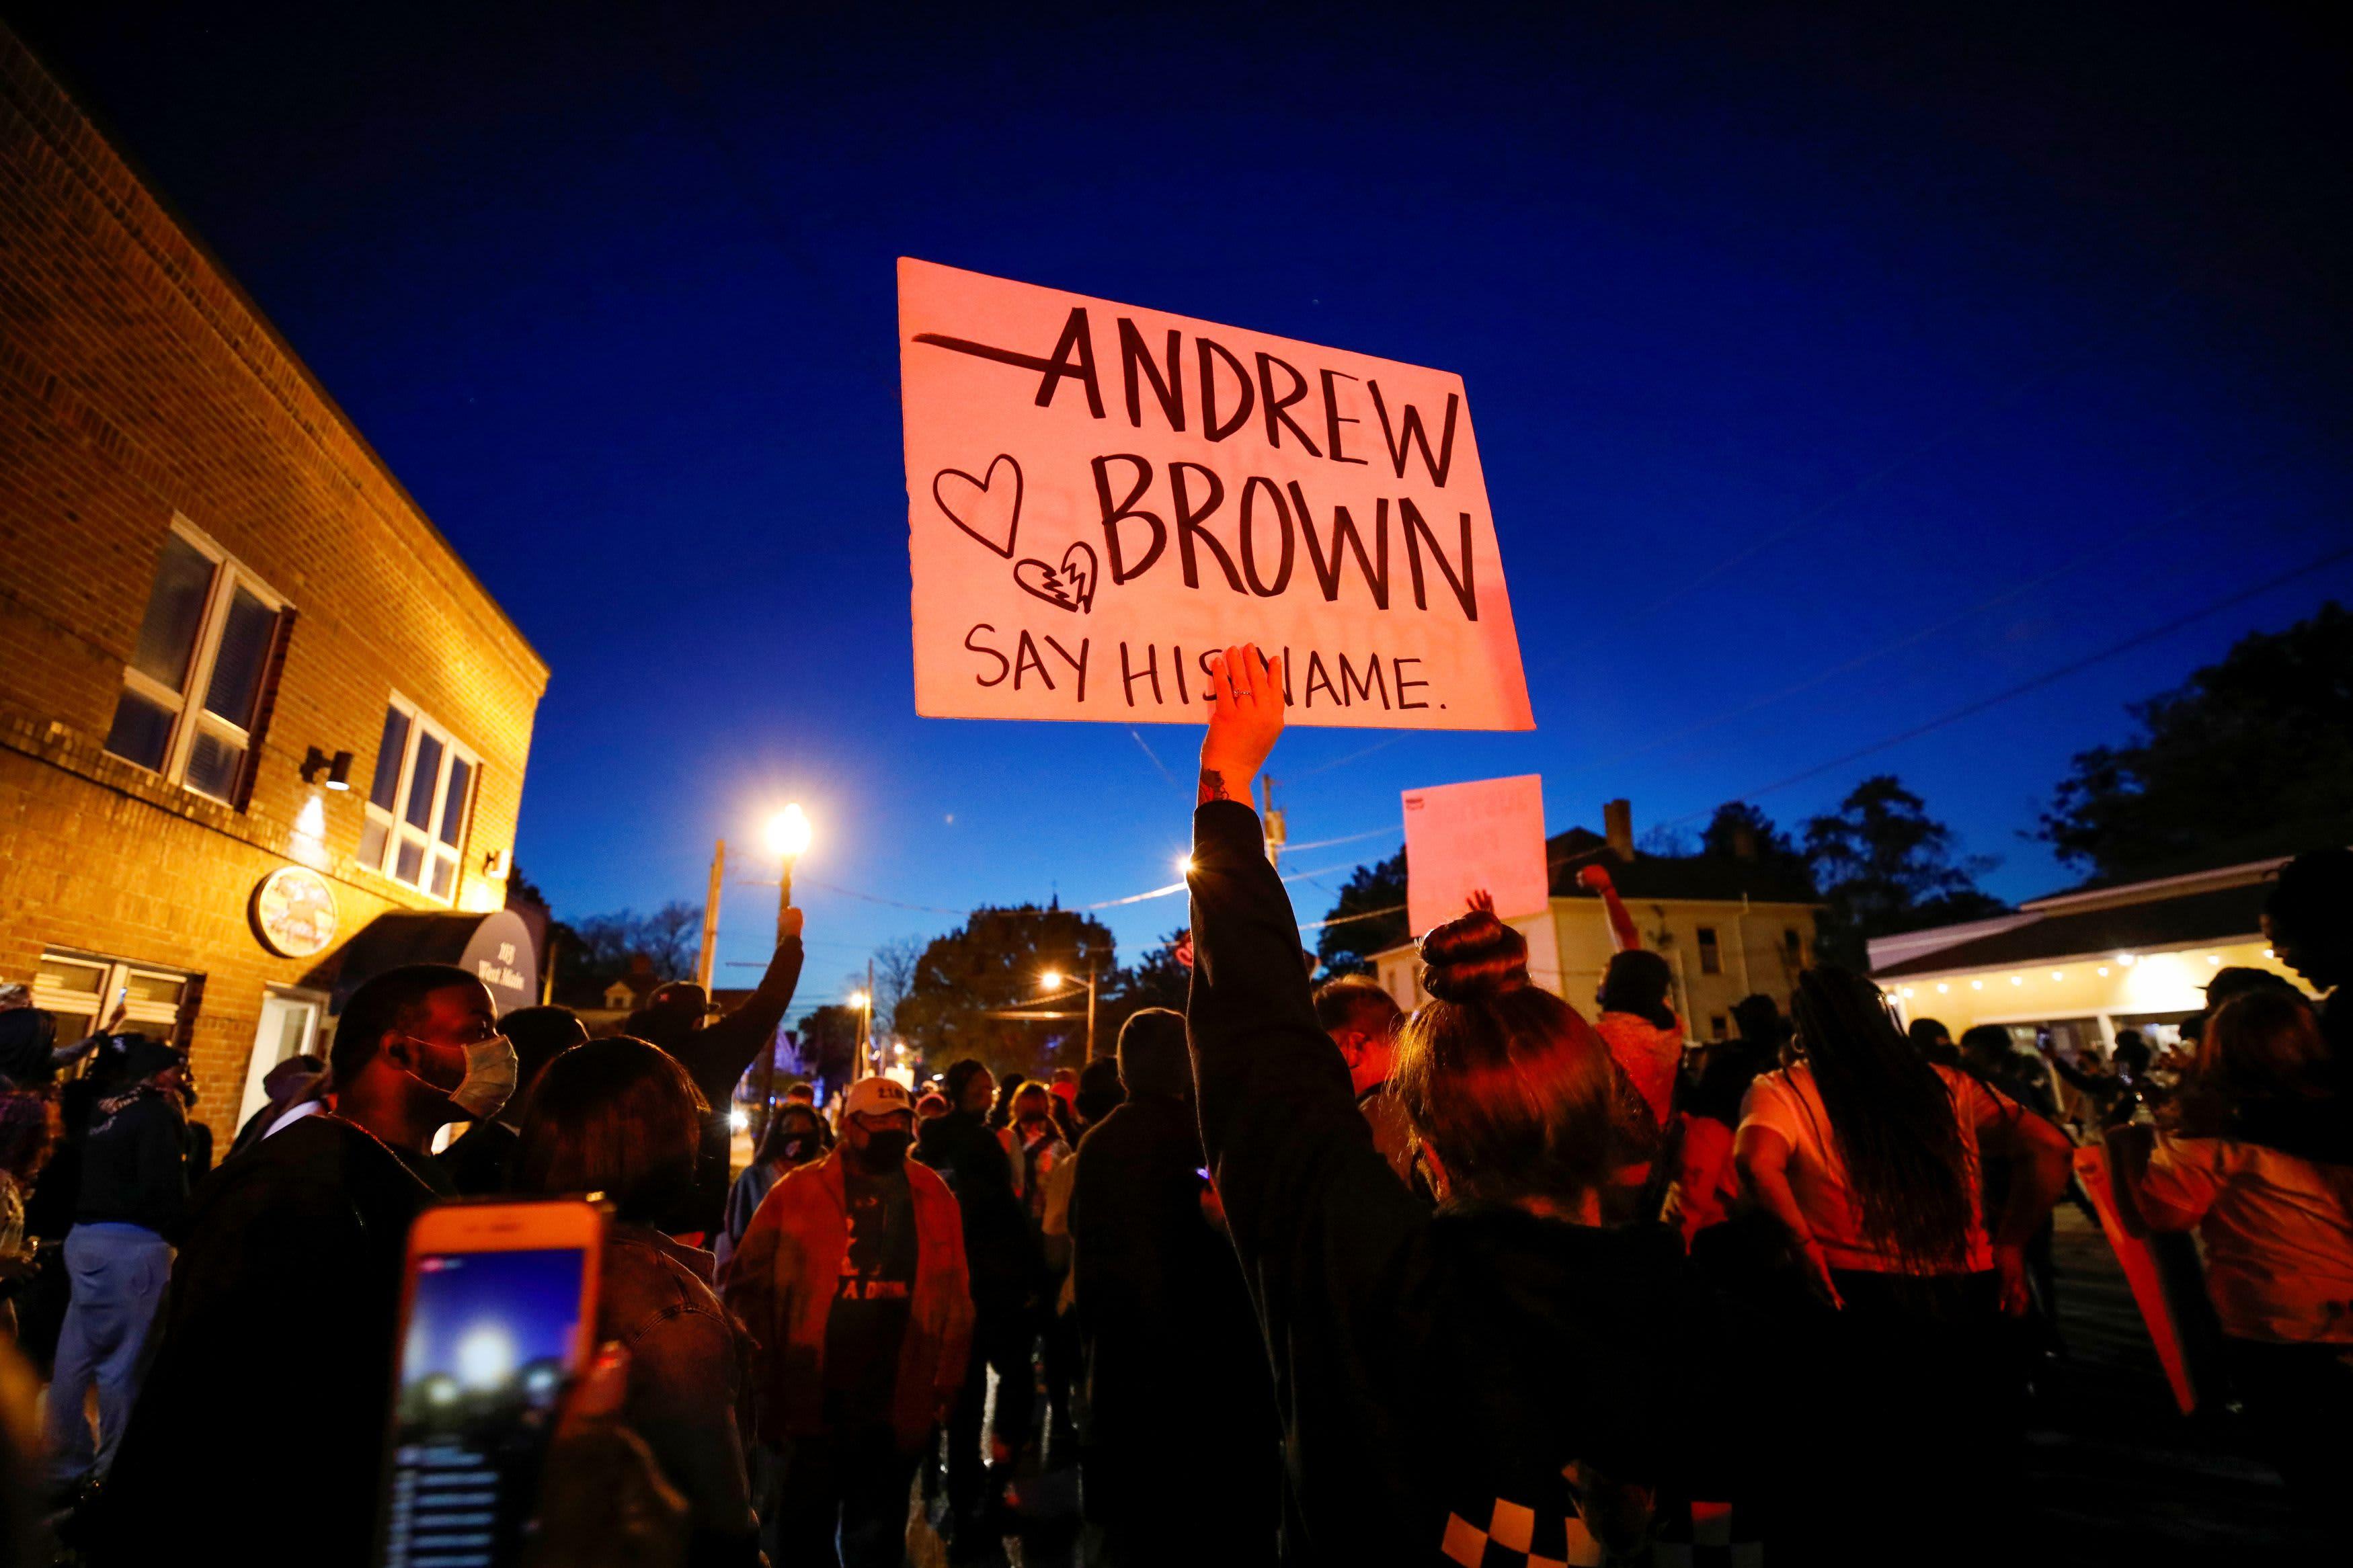 FBI opens civil rights probe into killing of Andrew Brown Jr. in North Carolina – CNBC